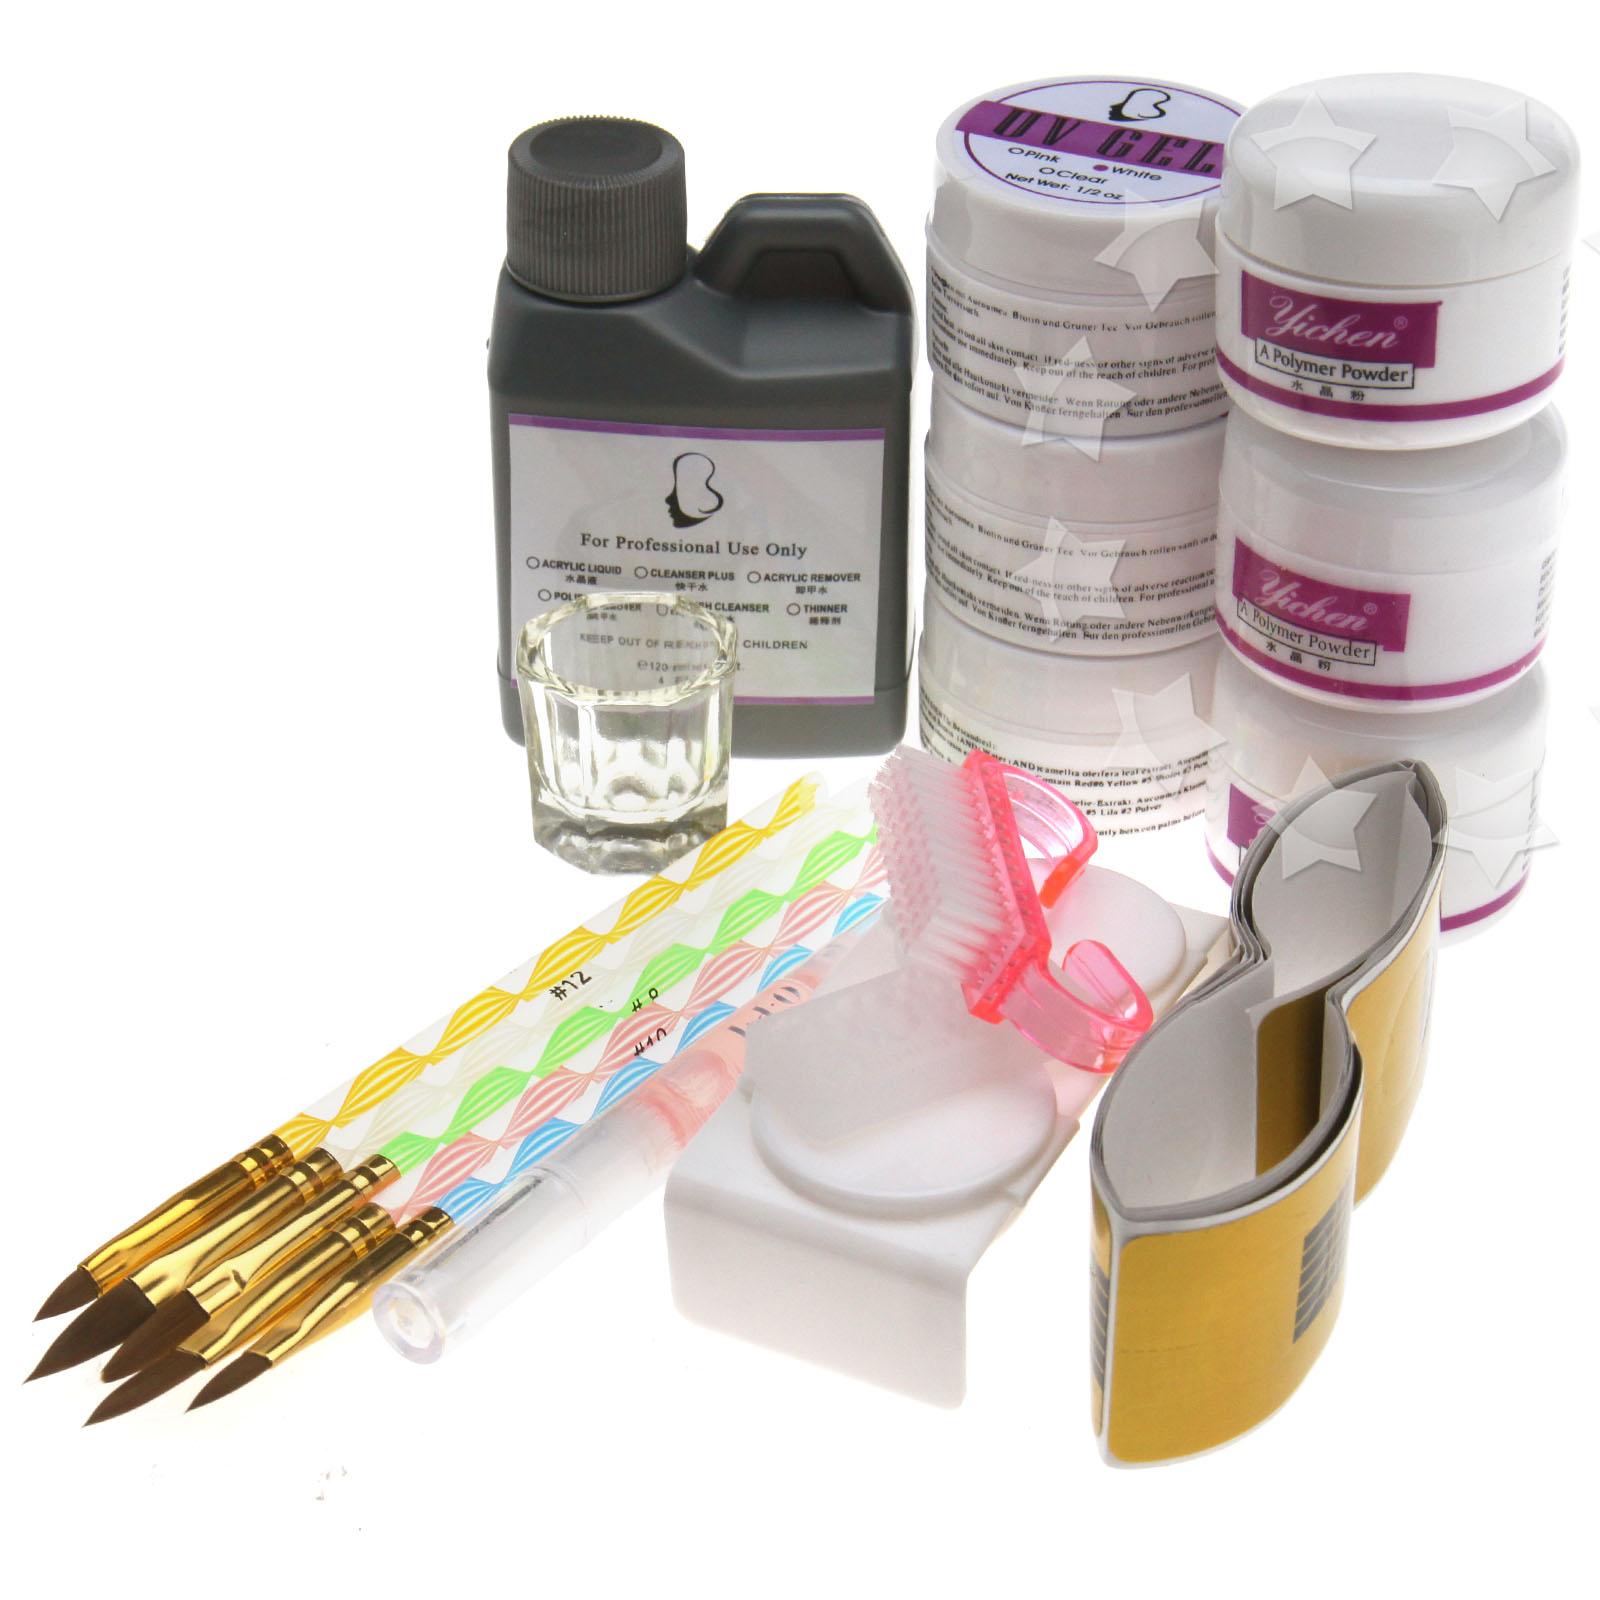 Acrylic UV Gel Nail Art Kit With UV Gel Acrylic Powder